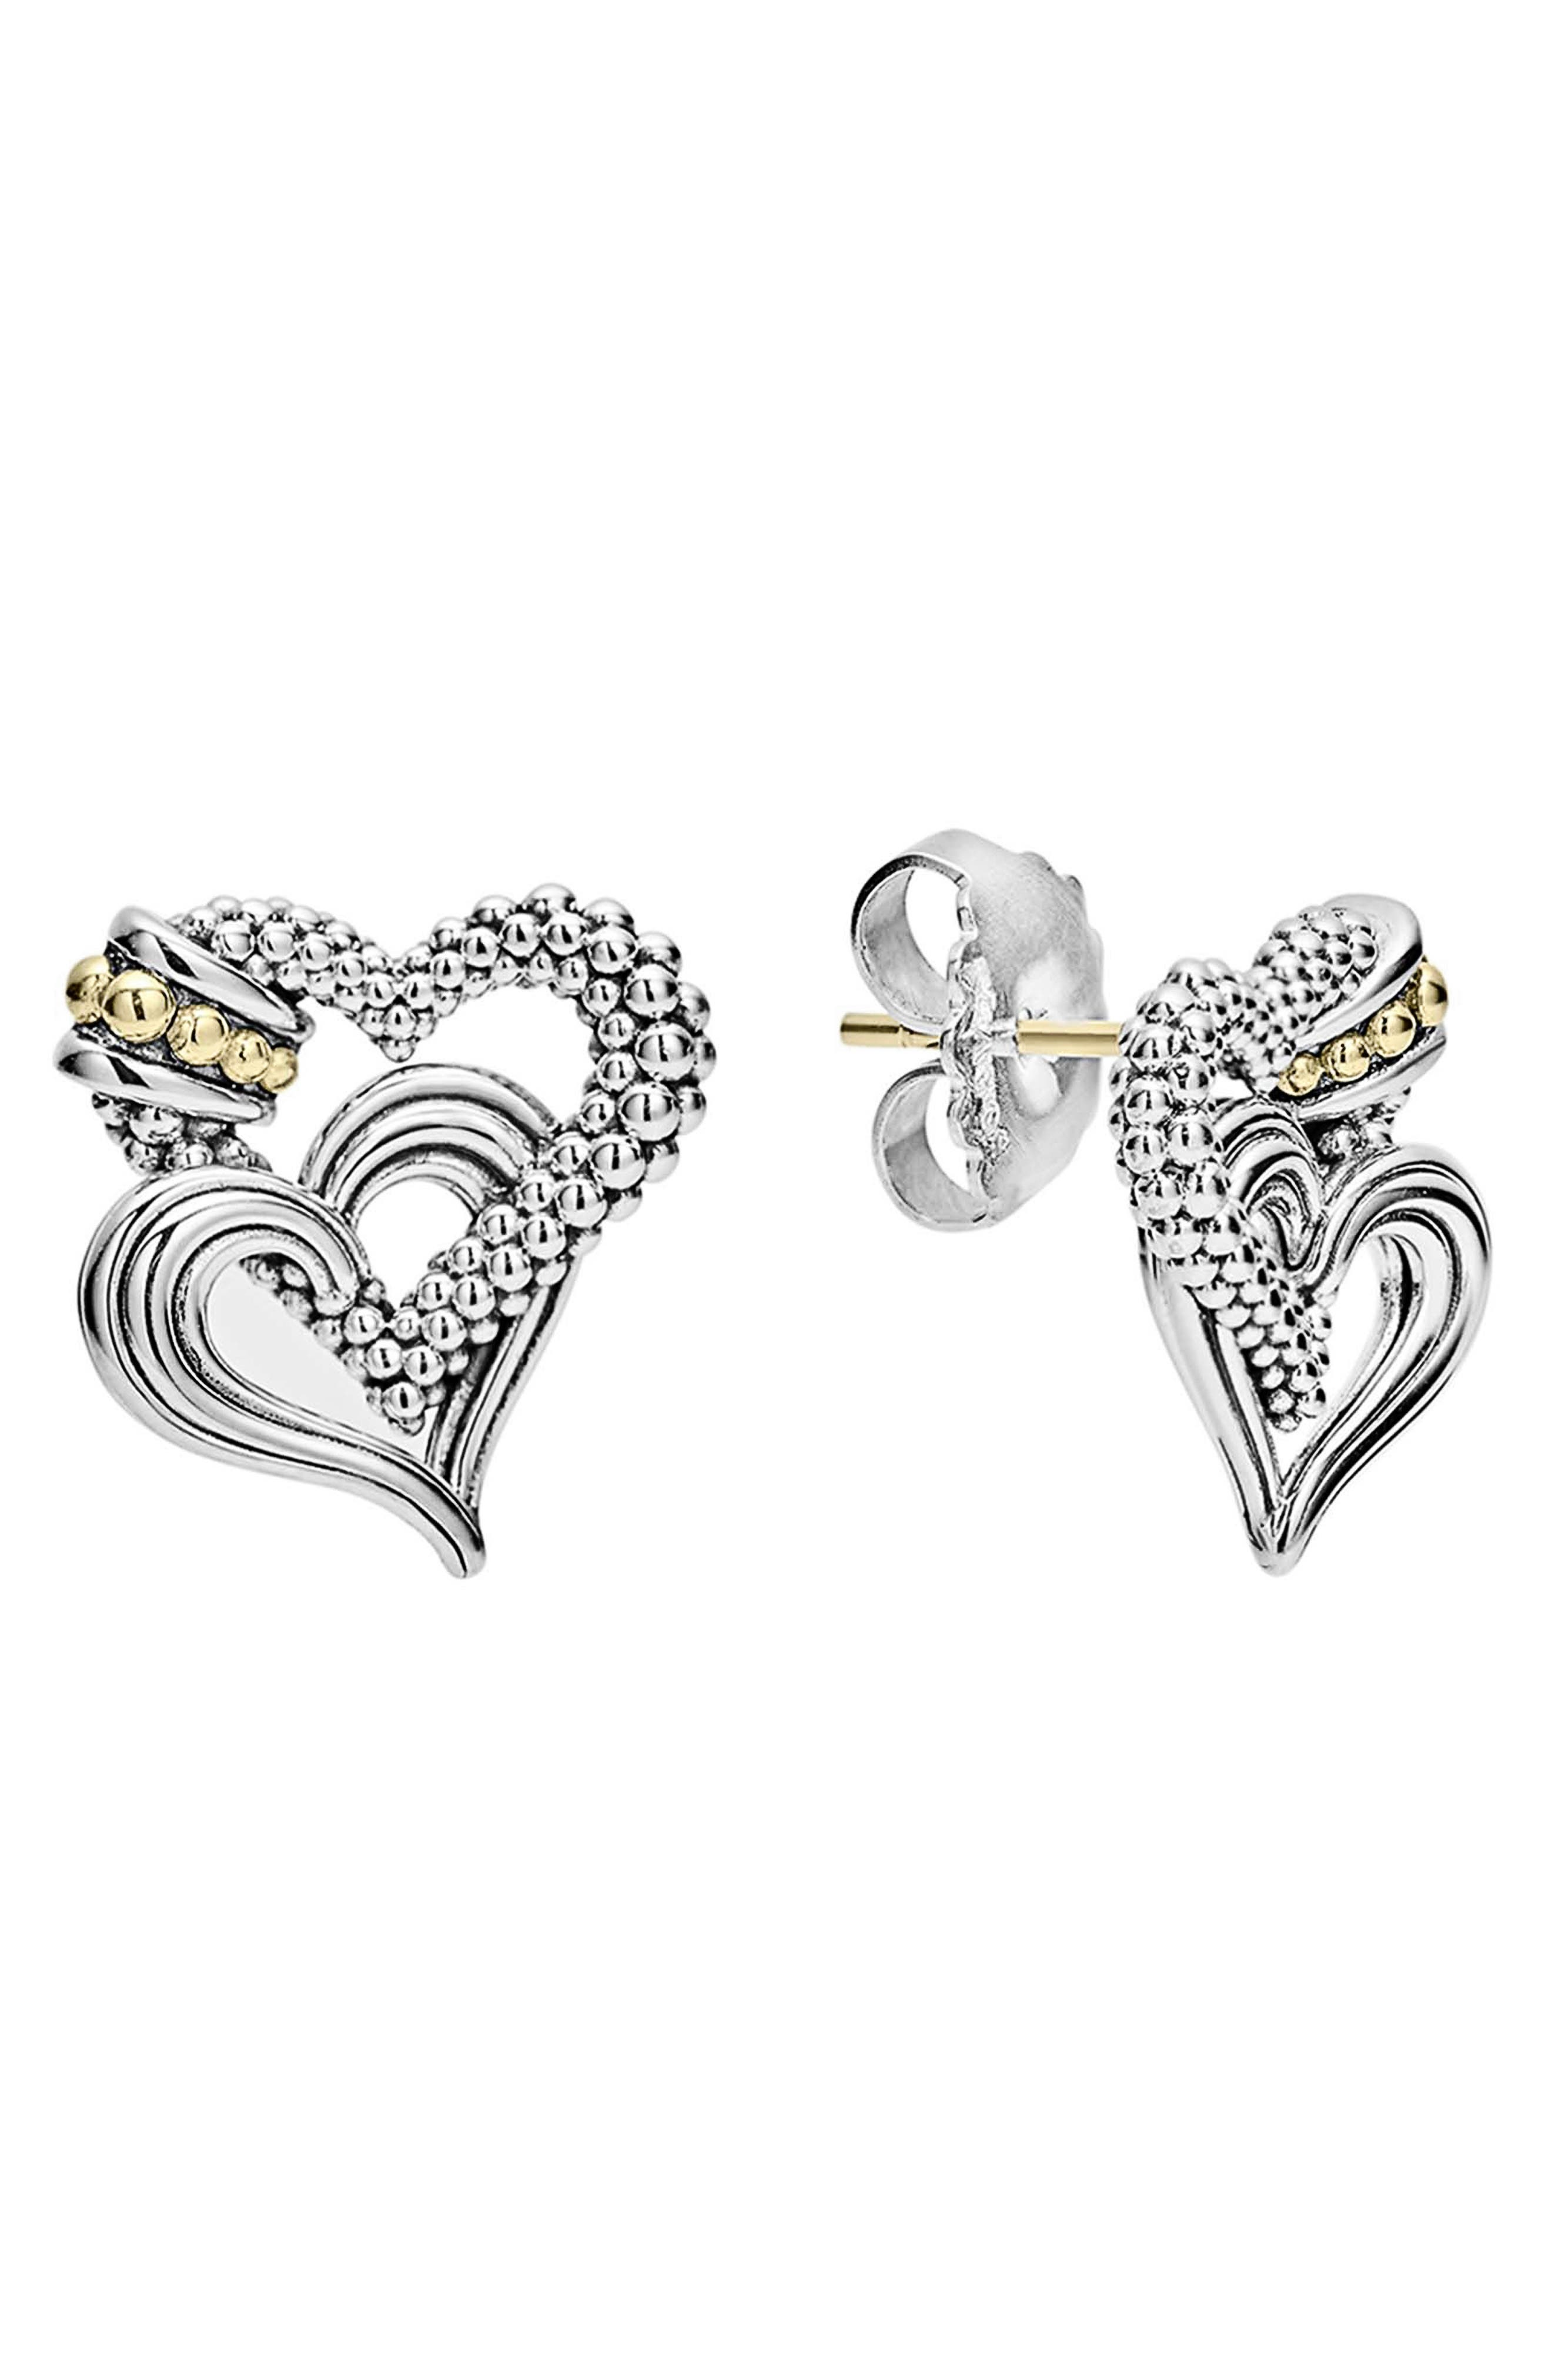 Beloved Stud Earrings,                             Main thumbnail 1, color,                             Sterling Silver